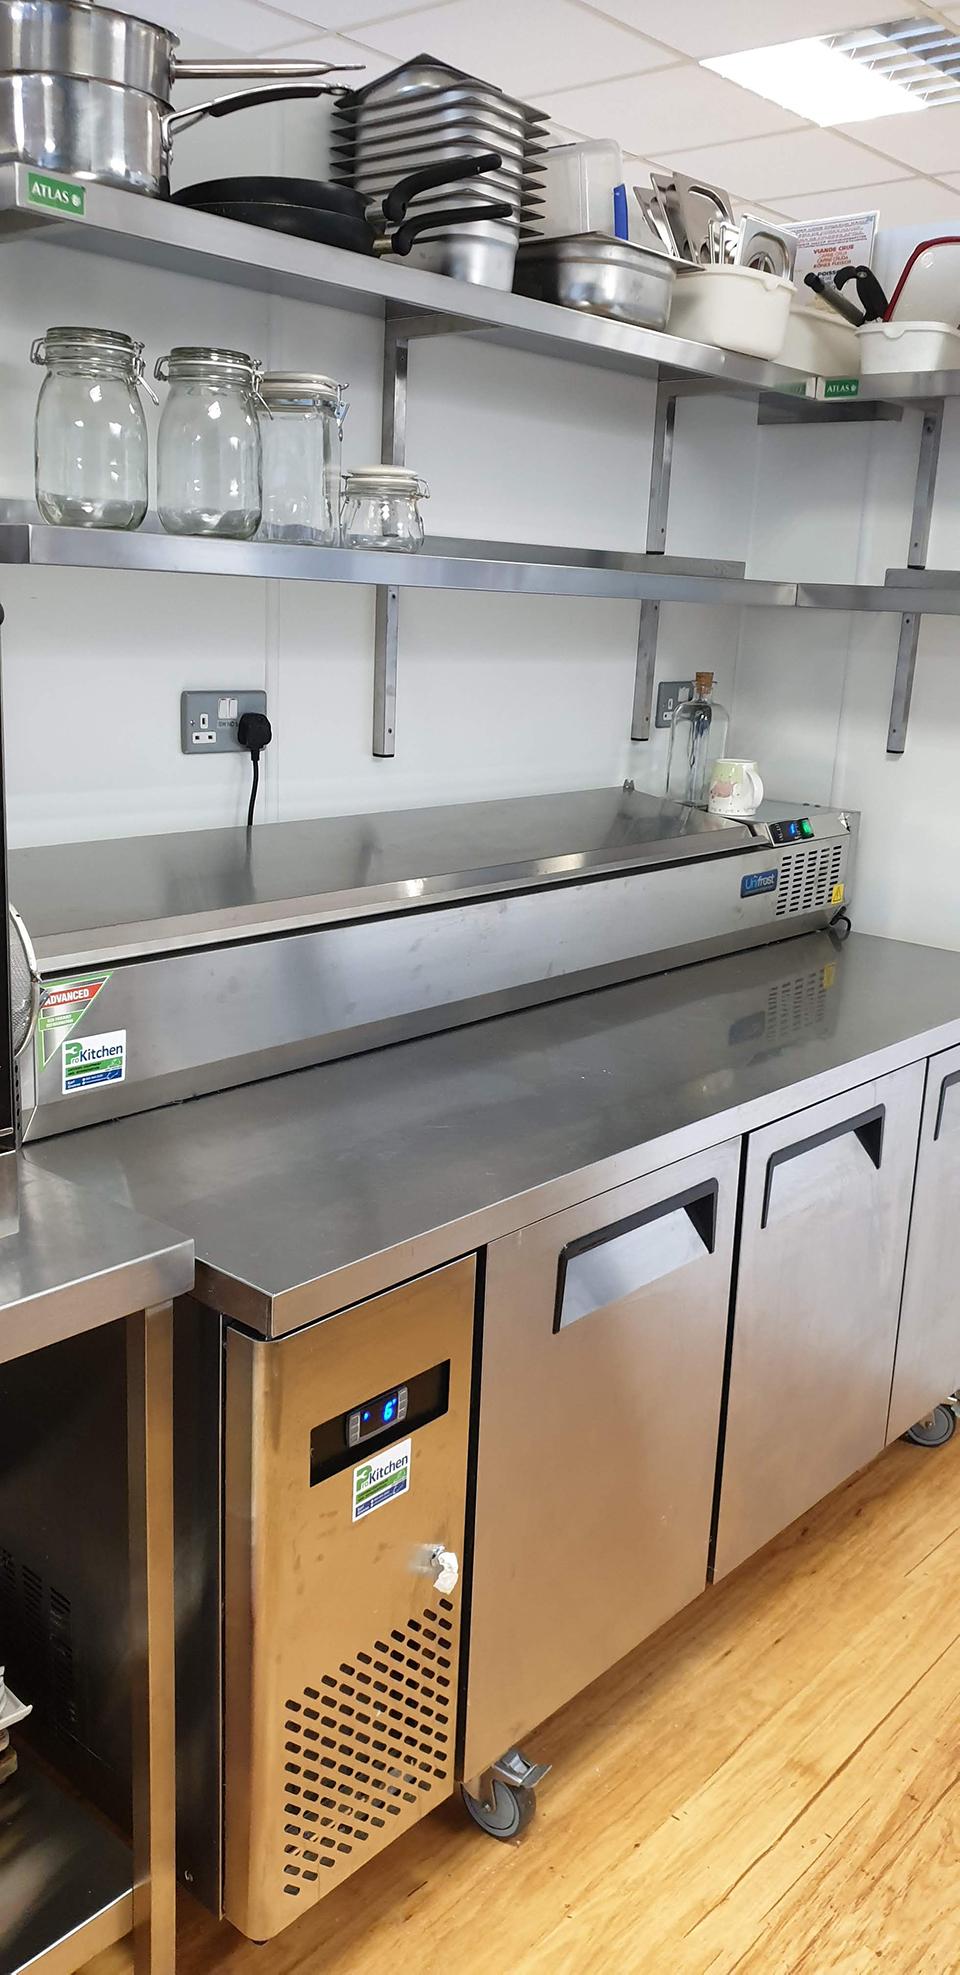 kitchen food prep area deli Prokitchen catering equipment and supplies